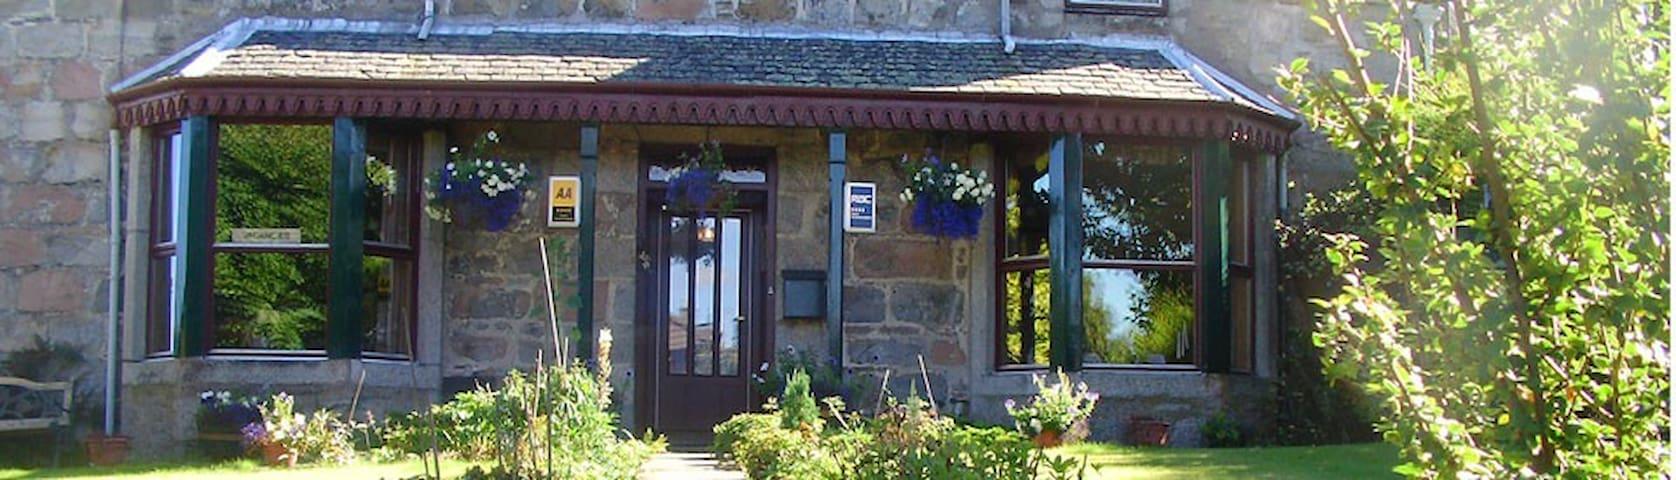 Garden Park Guest House - Grantown-on-Spey